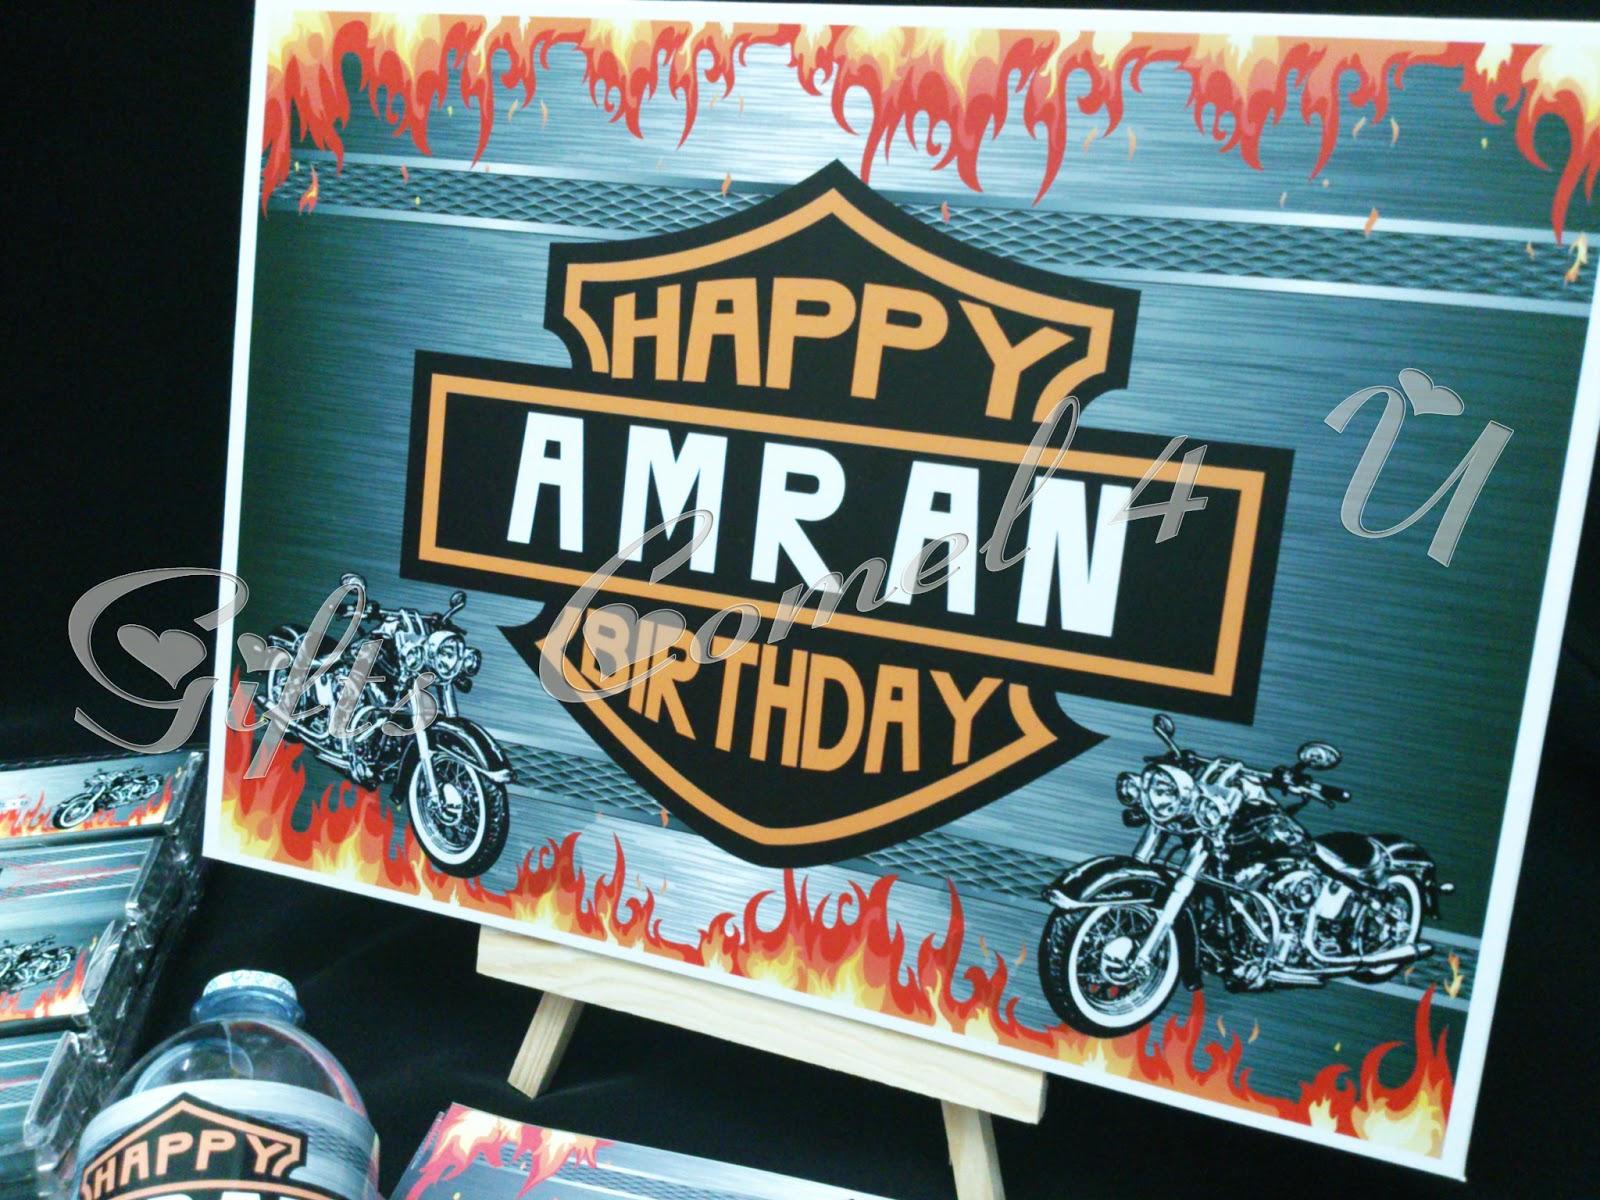 Harley Davidson Gift Card Laura Williams – Harley Davidson Birthday Cards